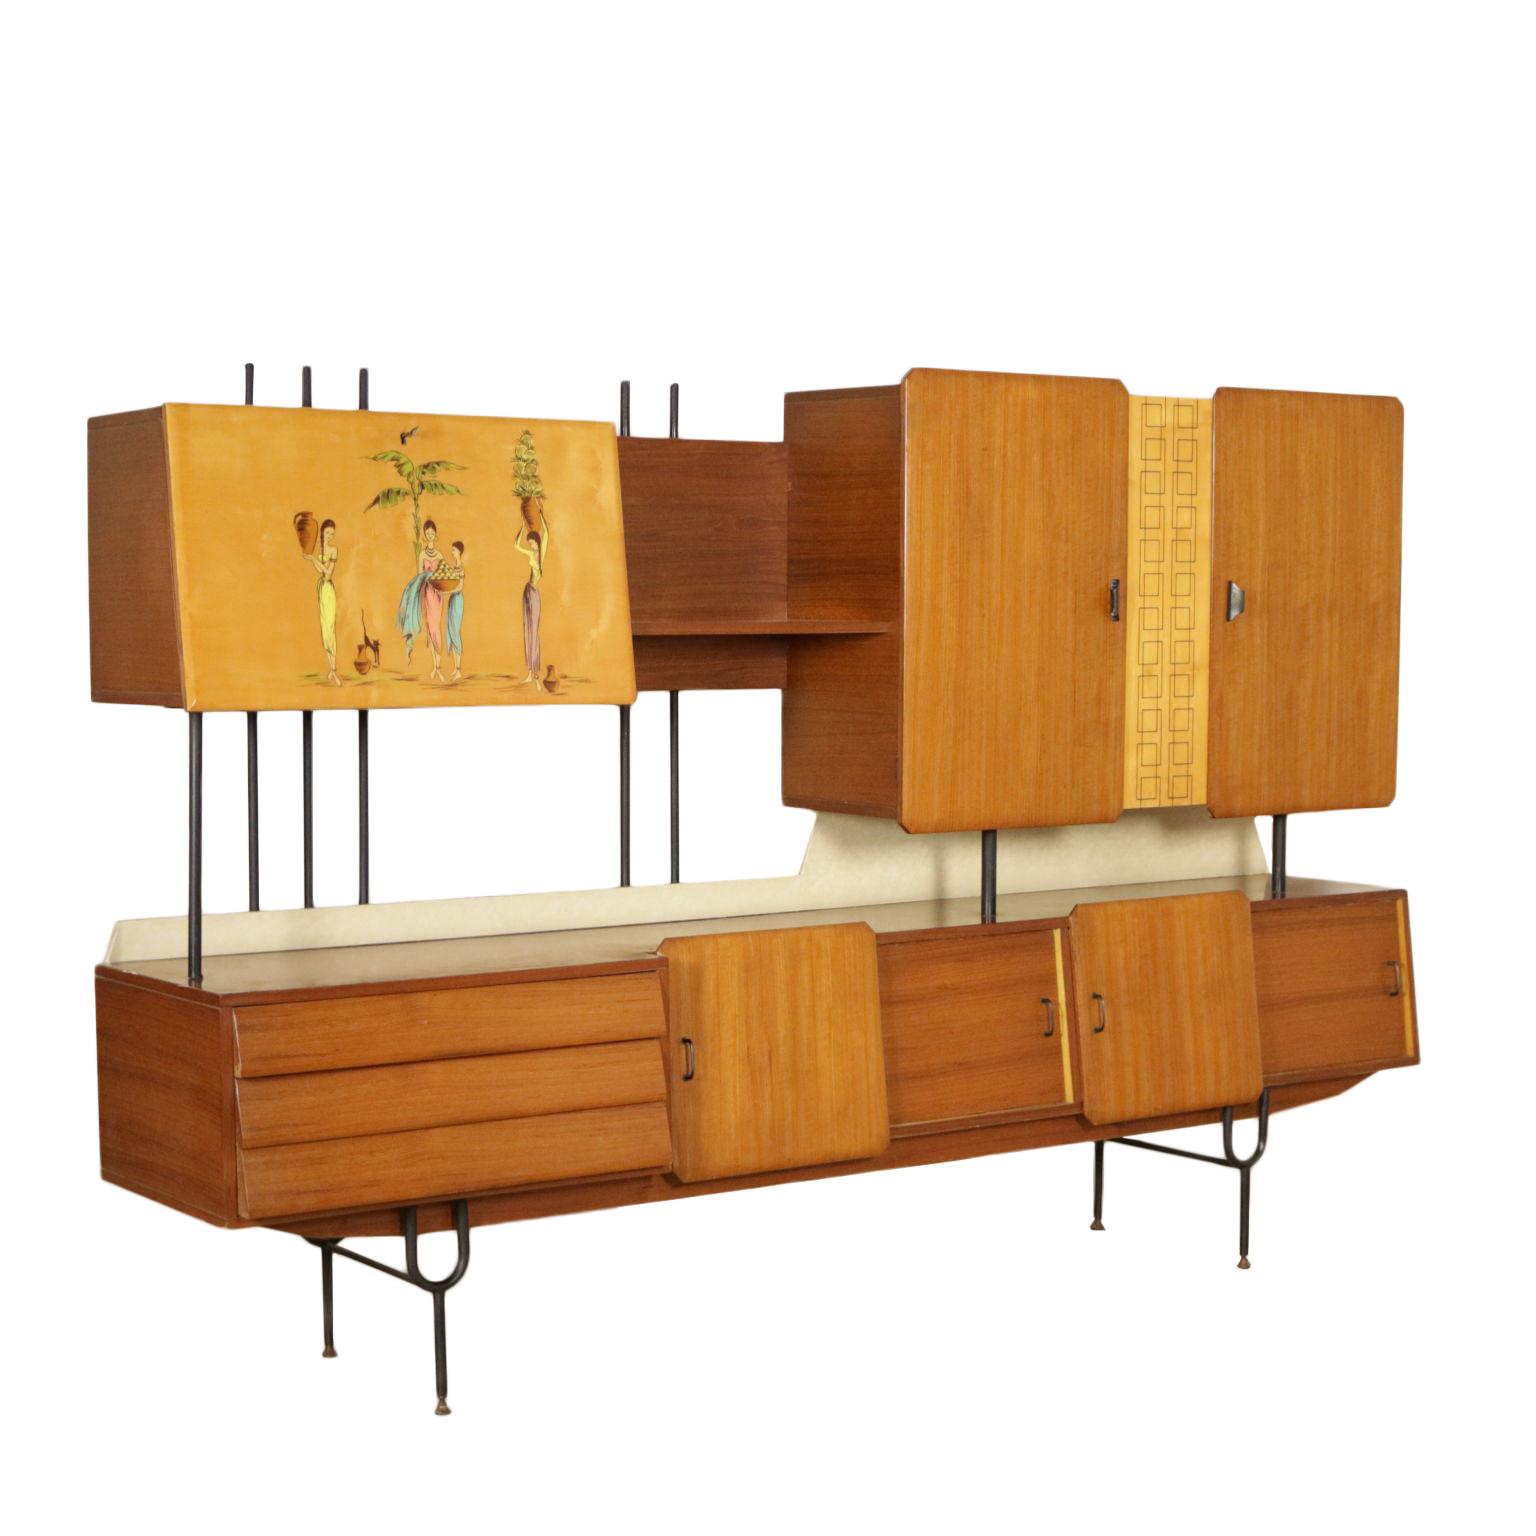 Meuble Buffet Année 50 buffet années '50-'60 - meubles - moderne - dimanoinmano.it